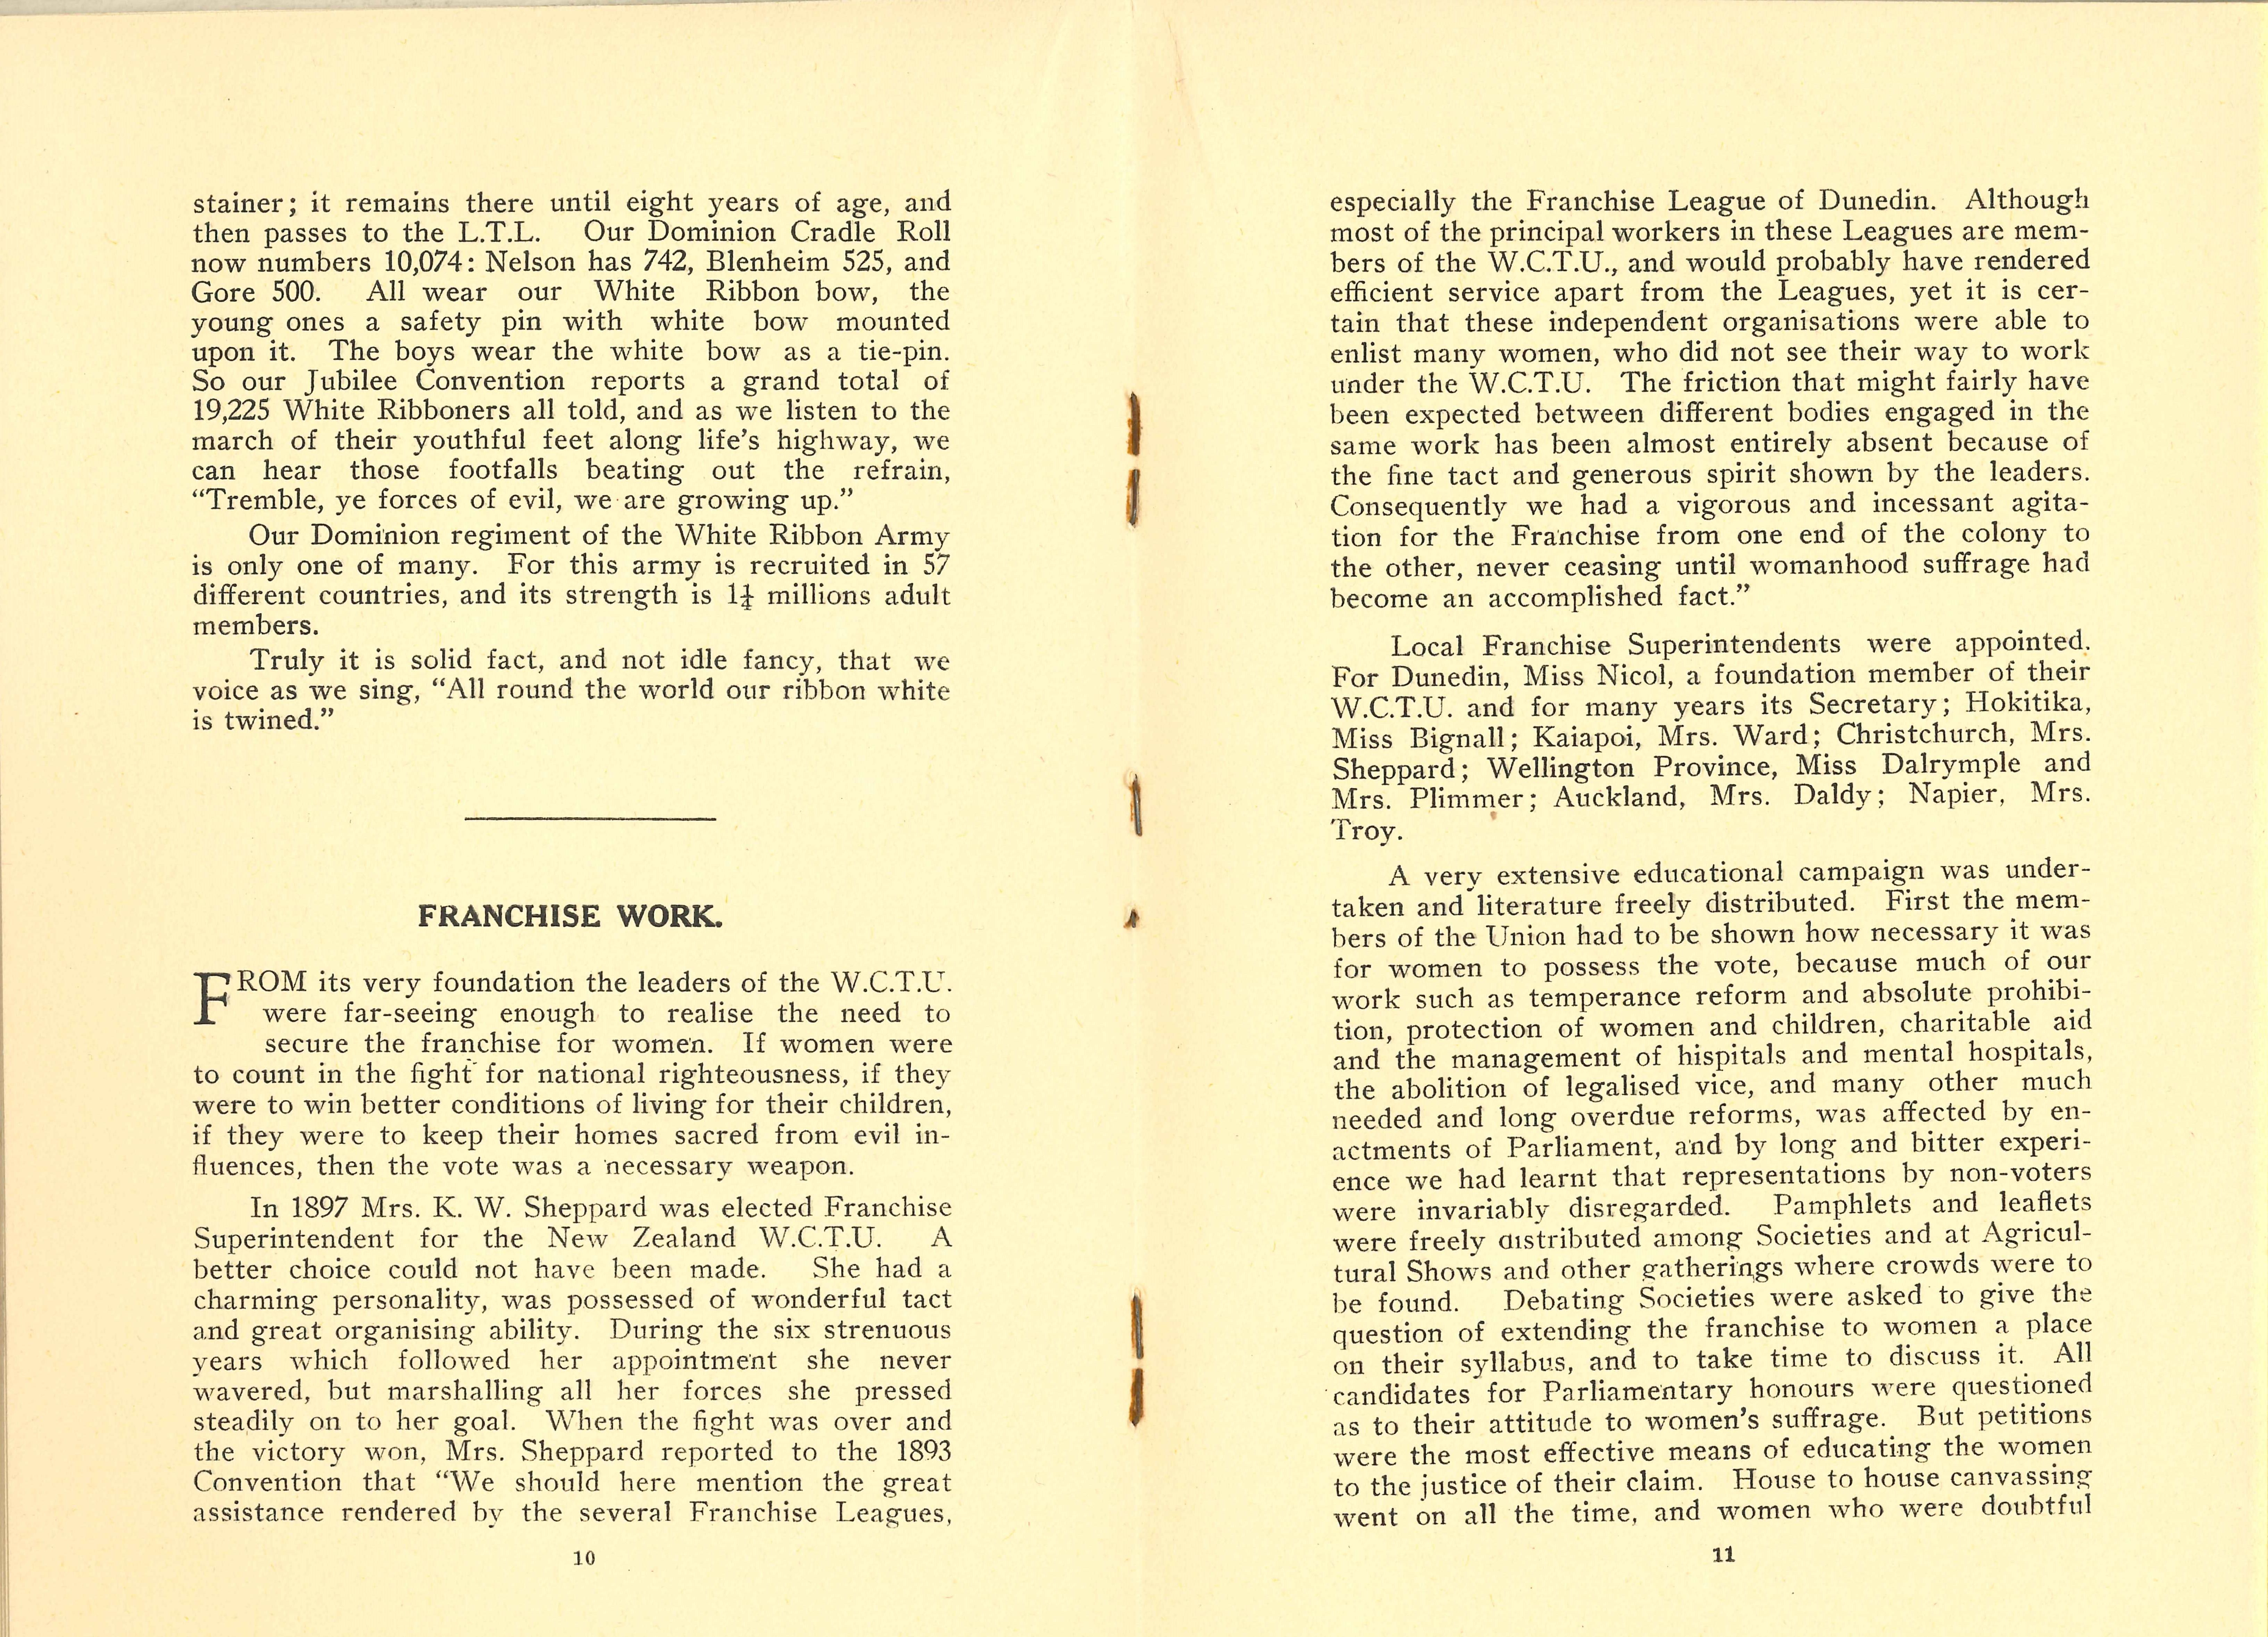 New Zealand Women's Christian Temperance Union. W.C.T.U.: fifty golden years. Wellington: Wright & Carman, Printers, 1934.